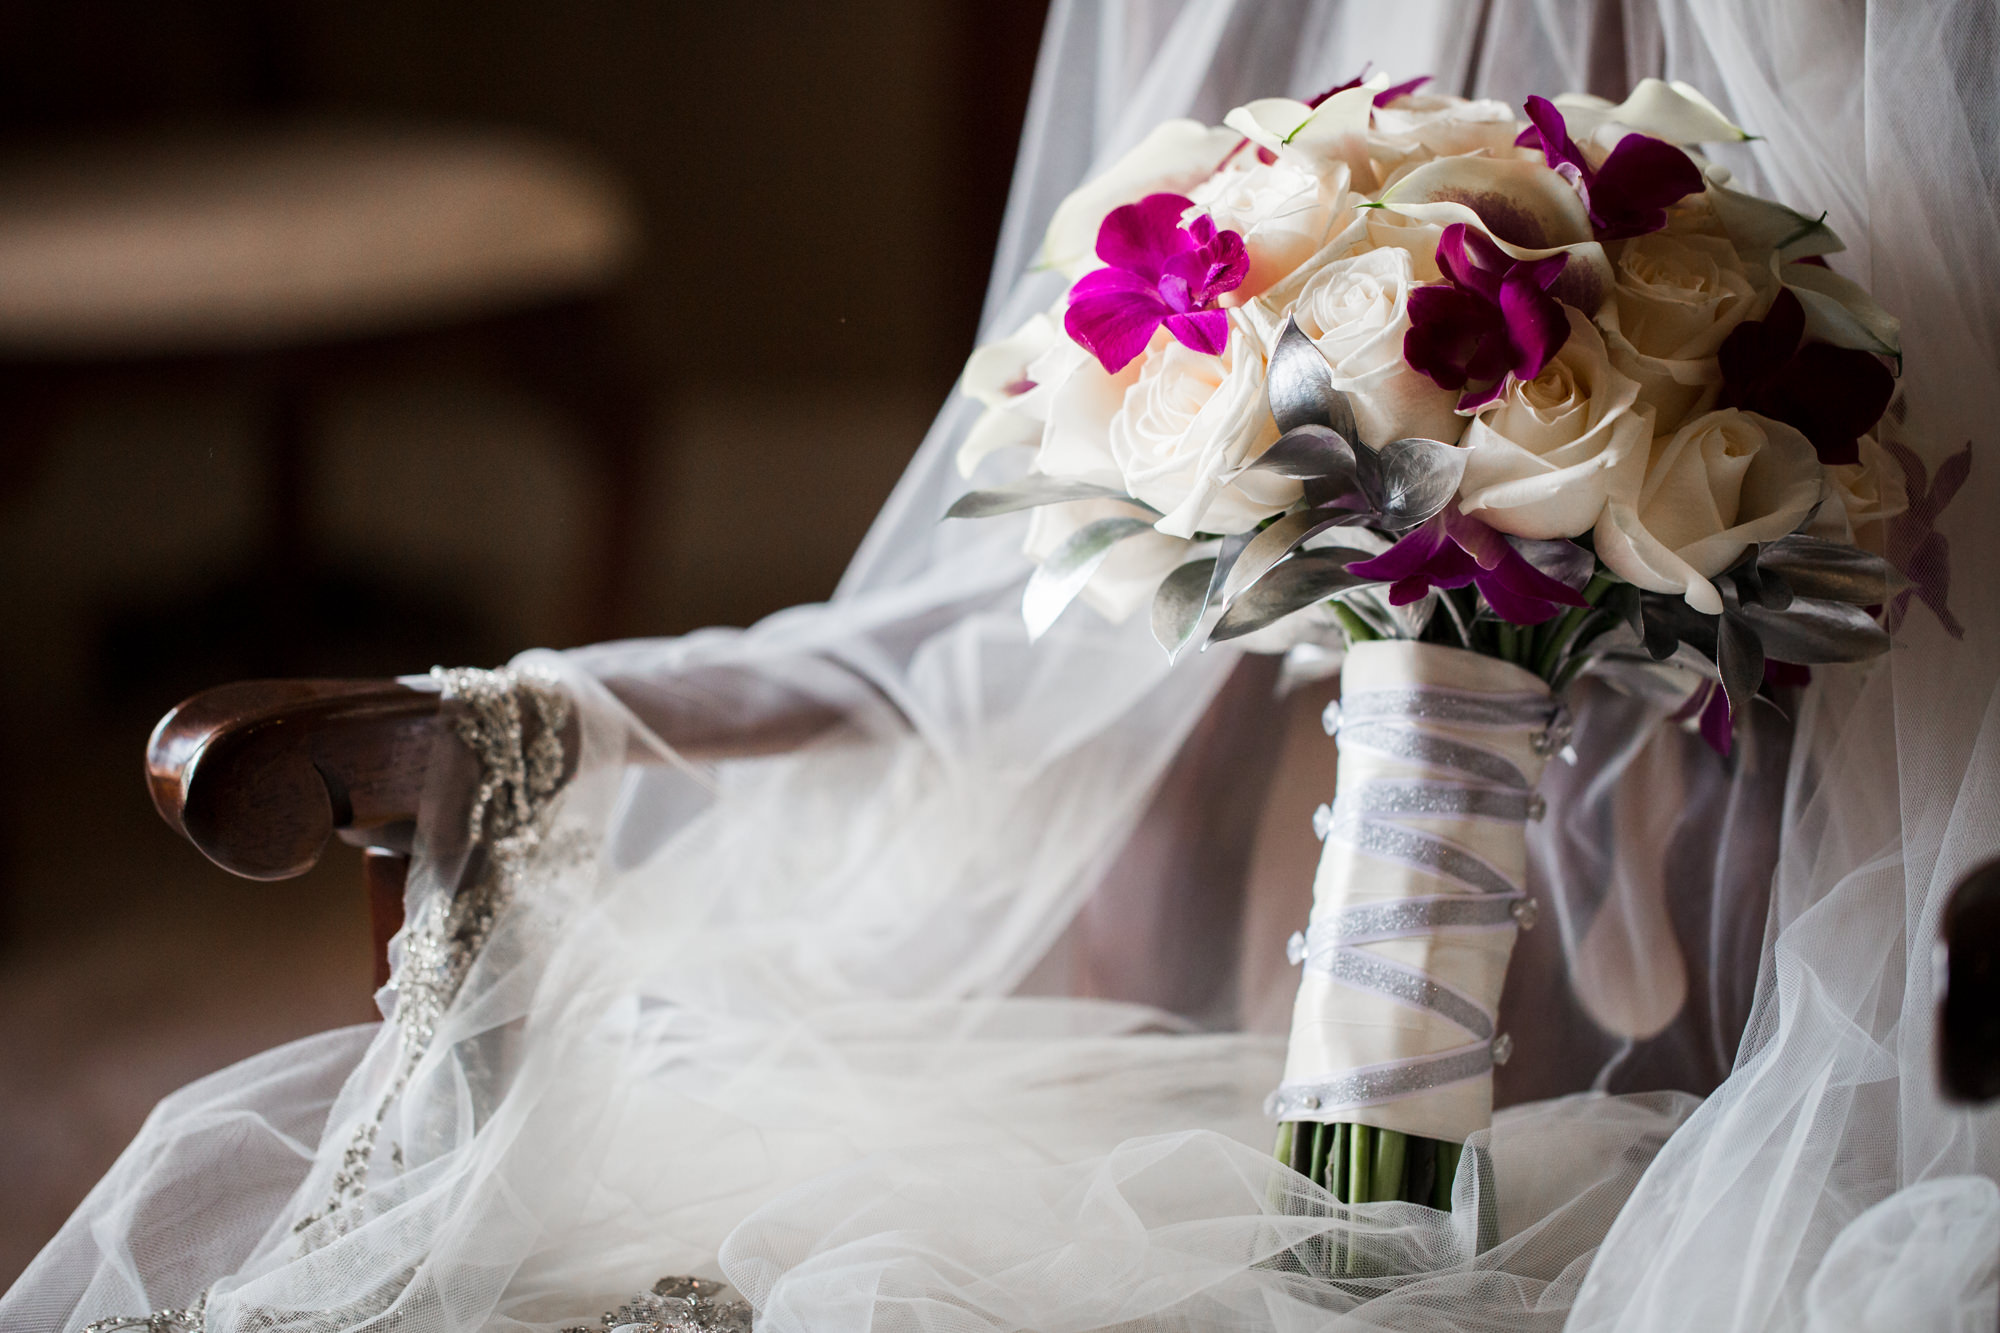 Benvenuto_Wedding_catholic_Florida_Bride-Groom-5.jpg